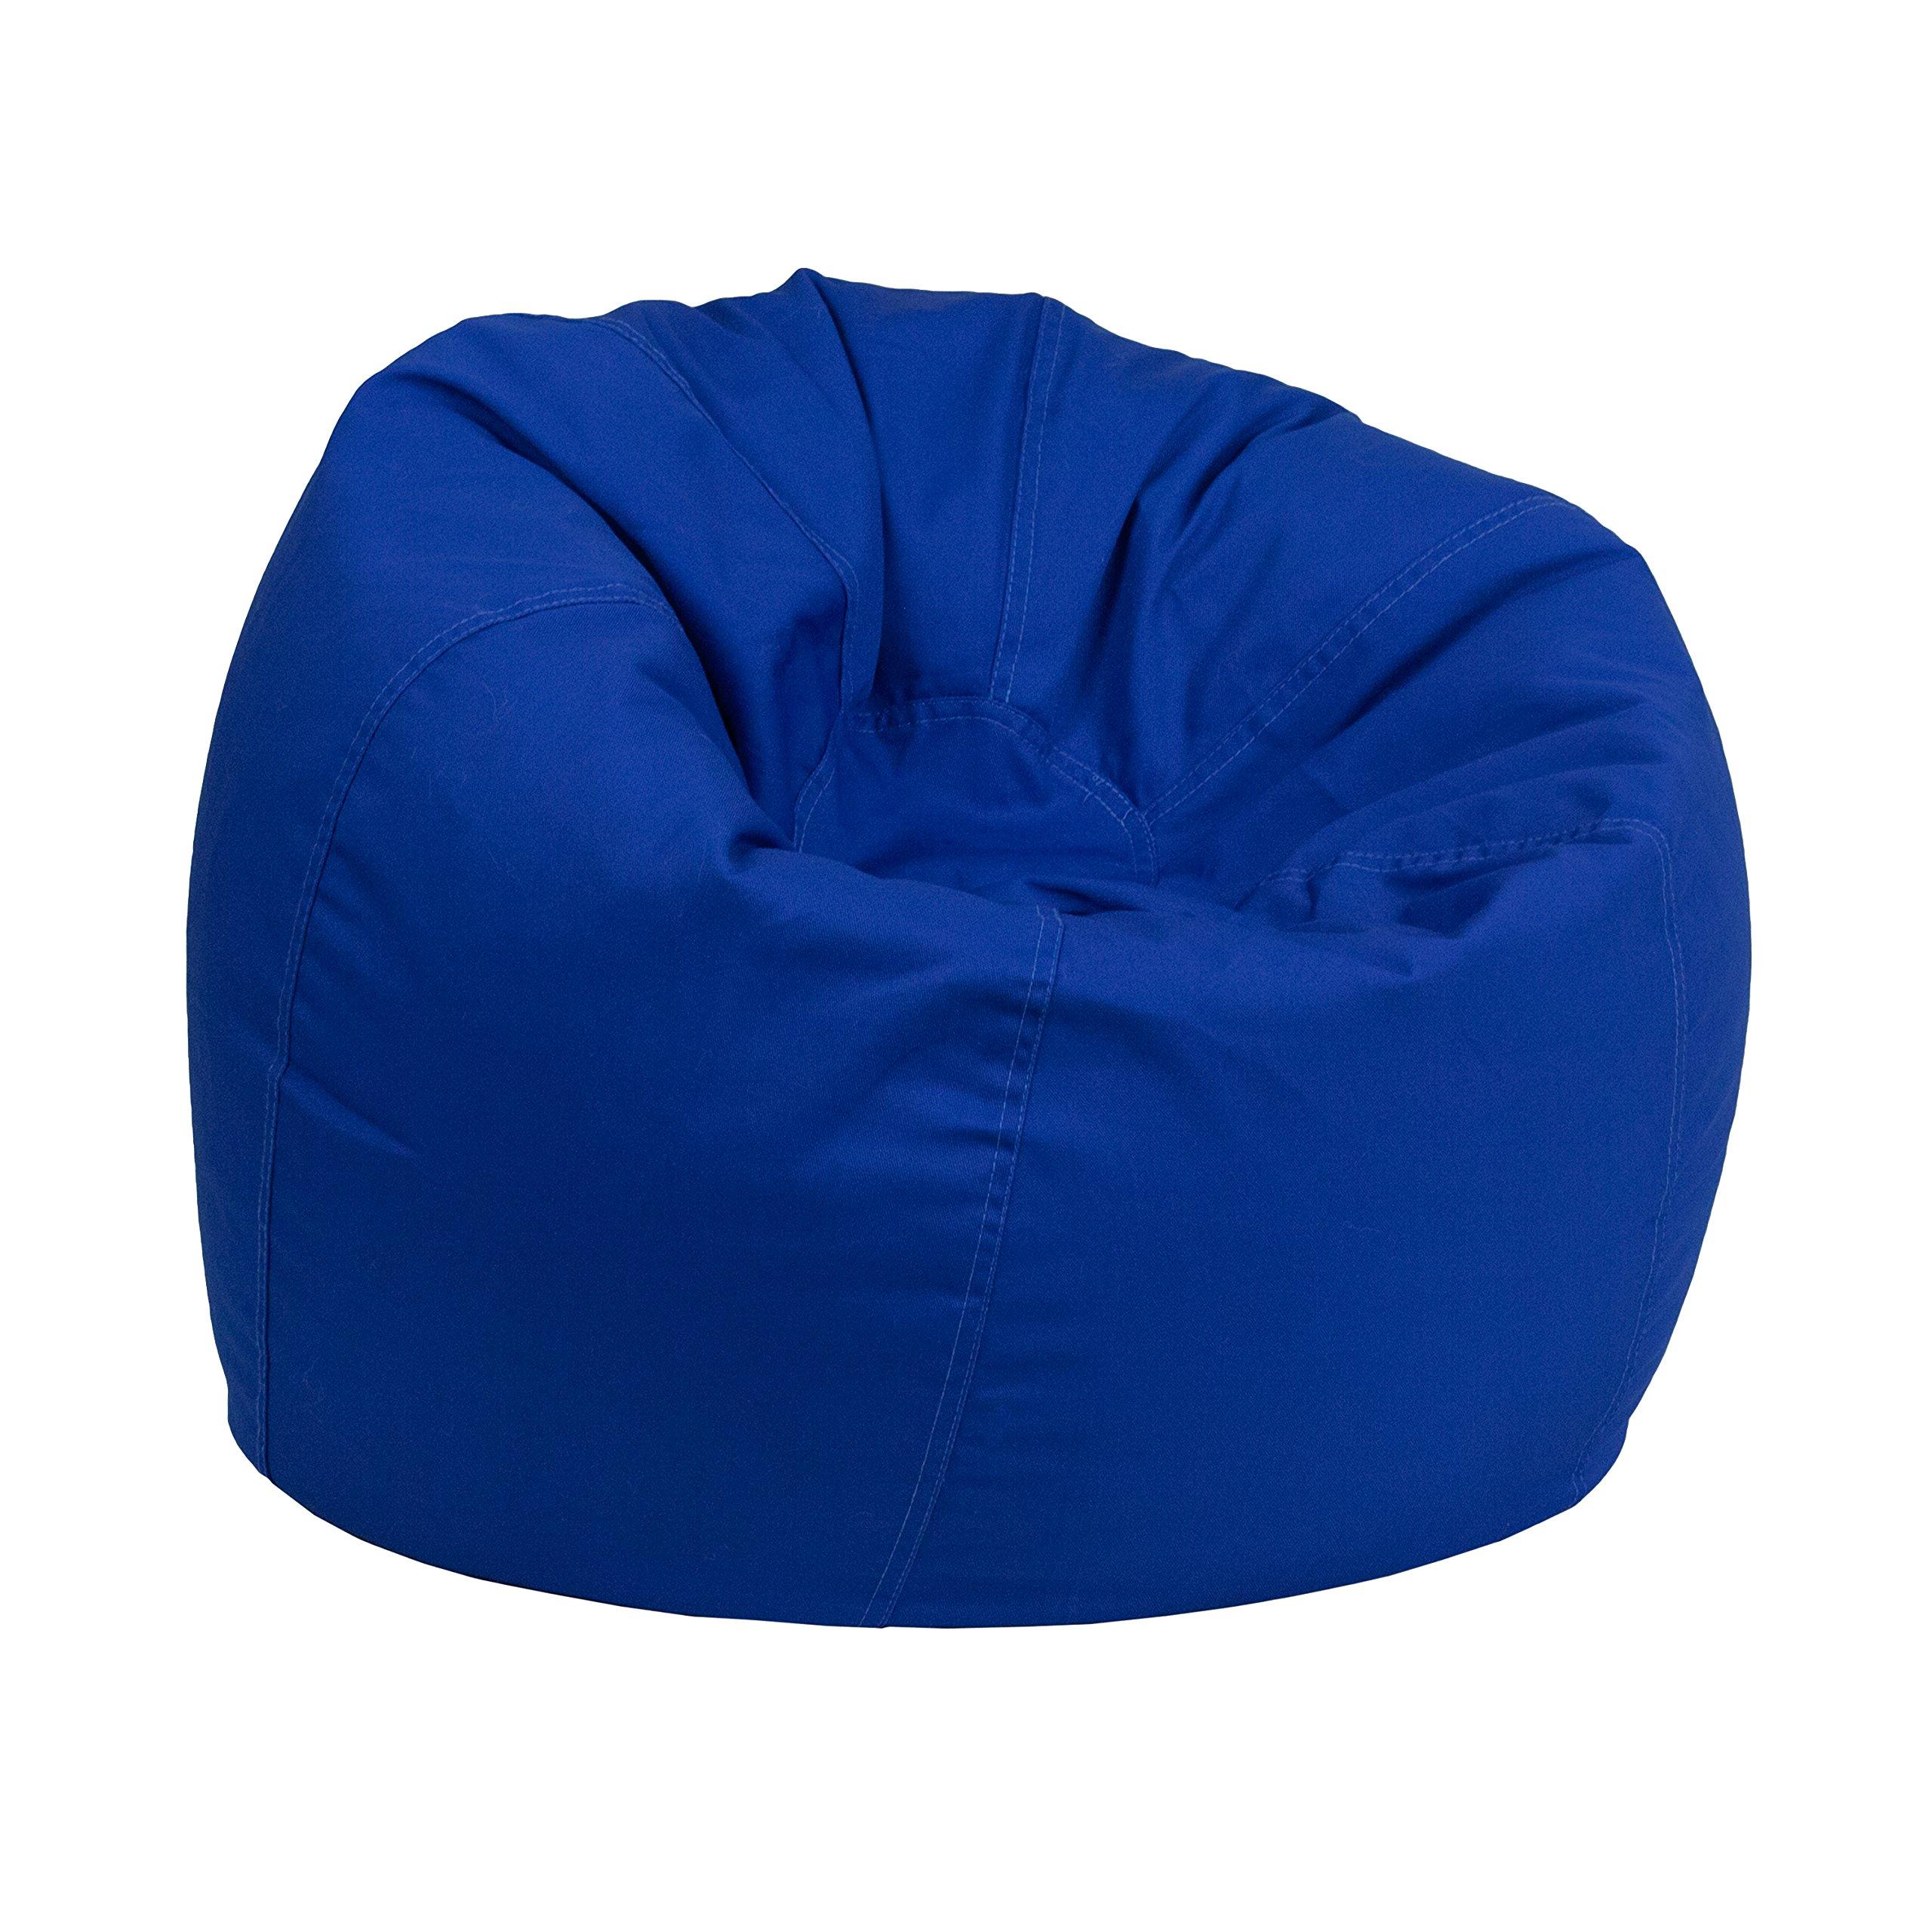 Flash Furniture Small Solid Royal Blue Kids Bean Bag Chair